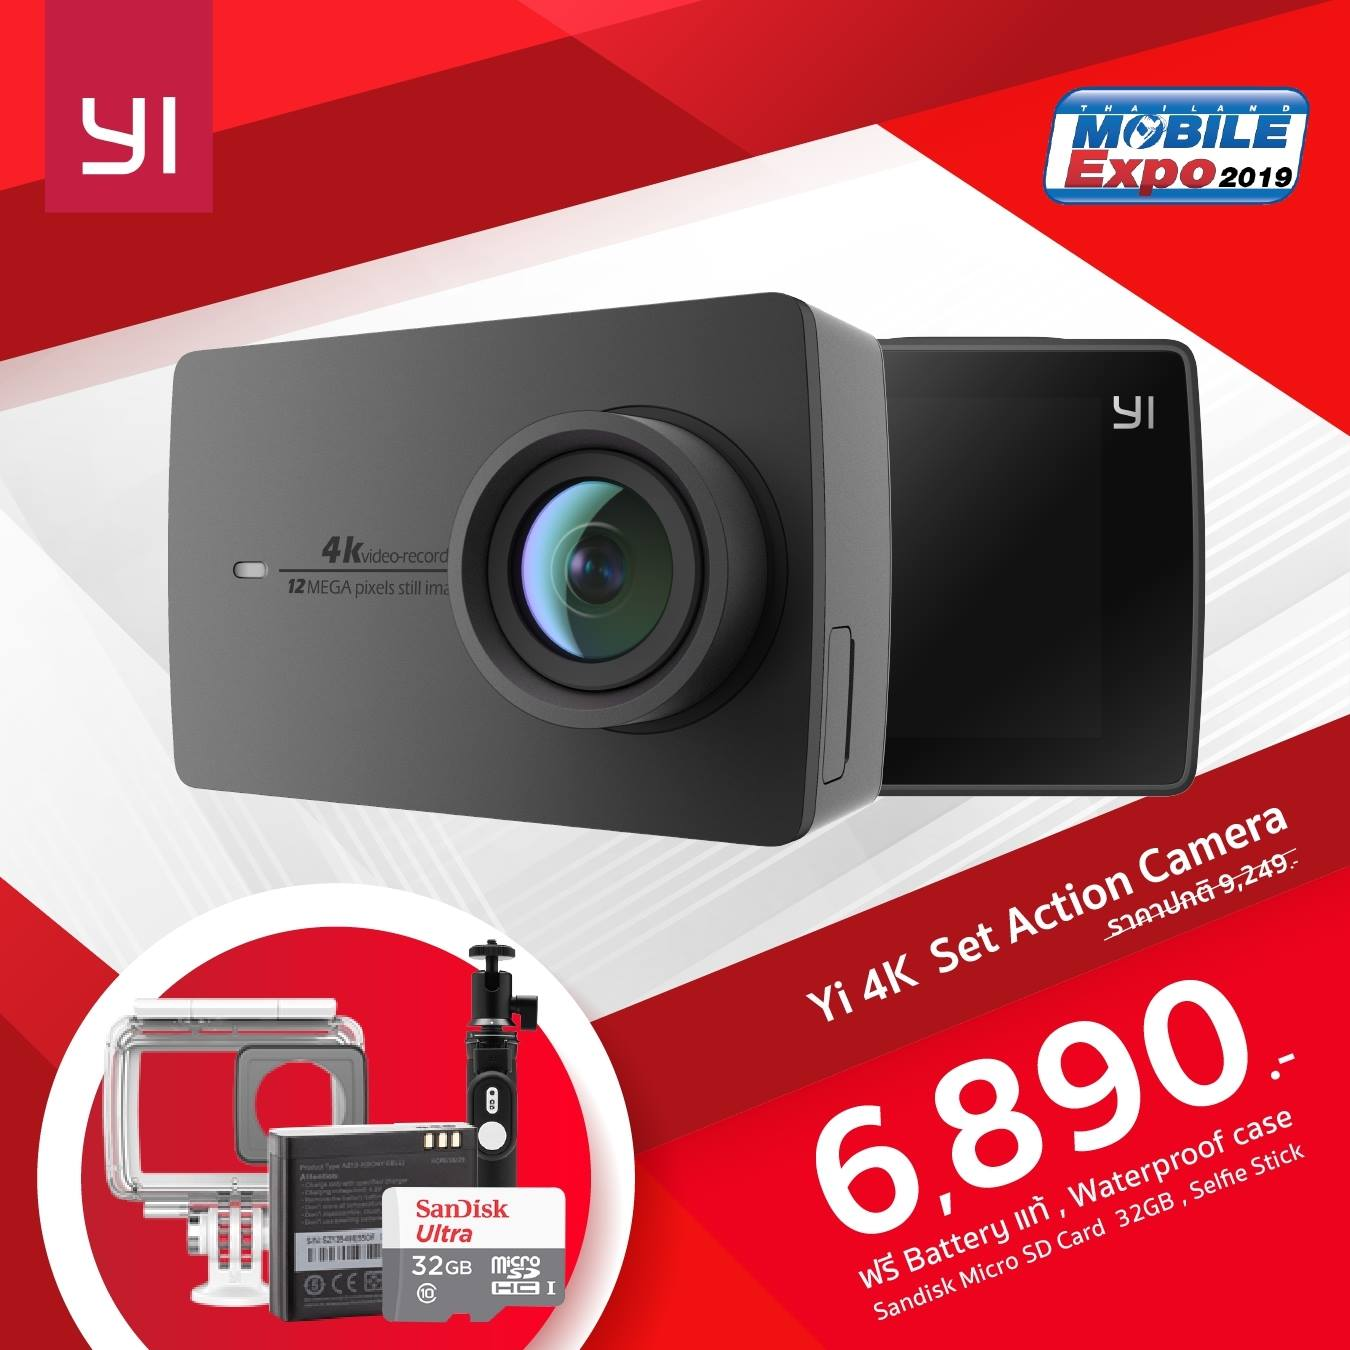 Yi Thailand Promotion TME 2019 FEB 6